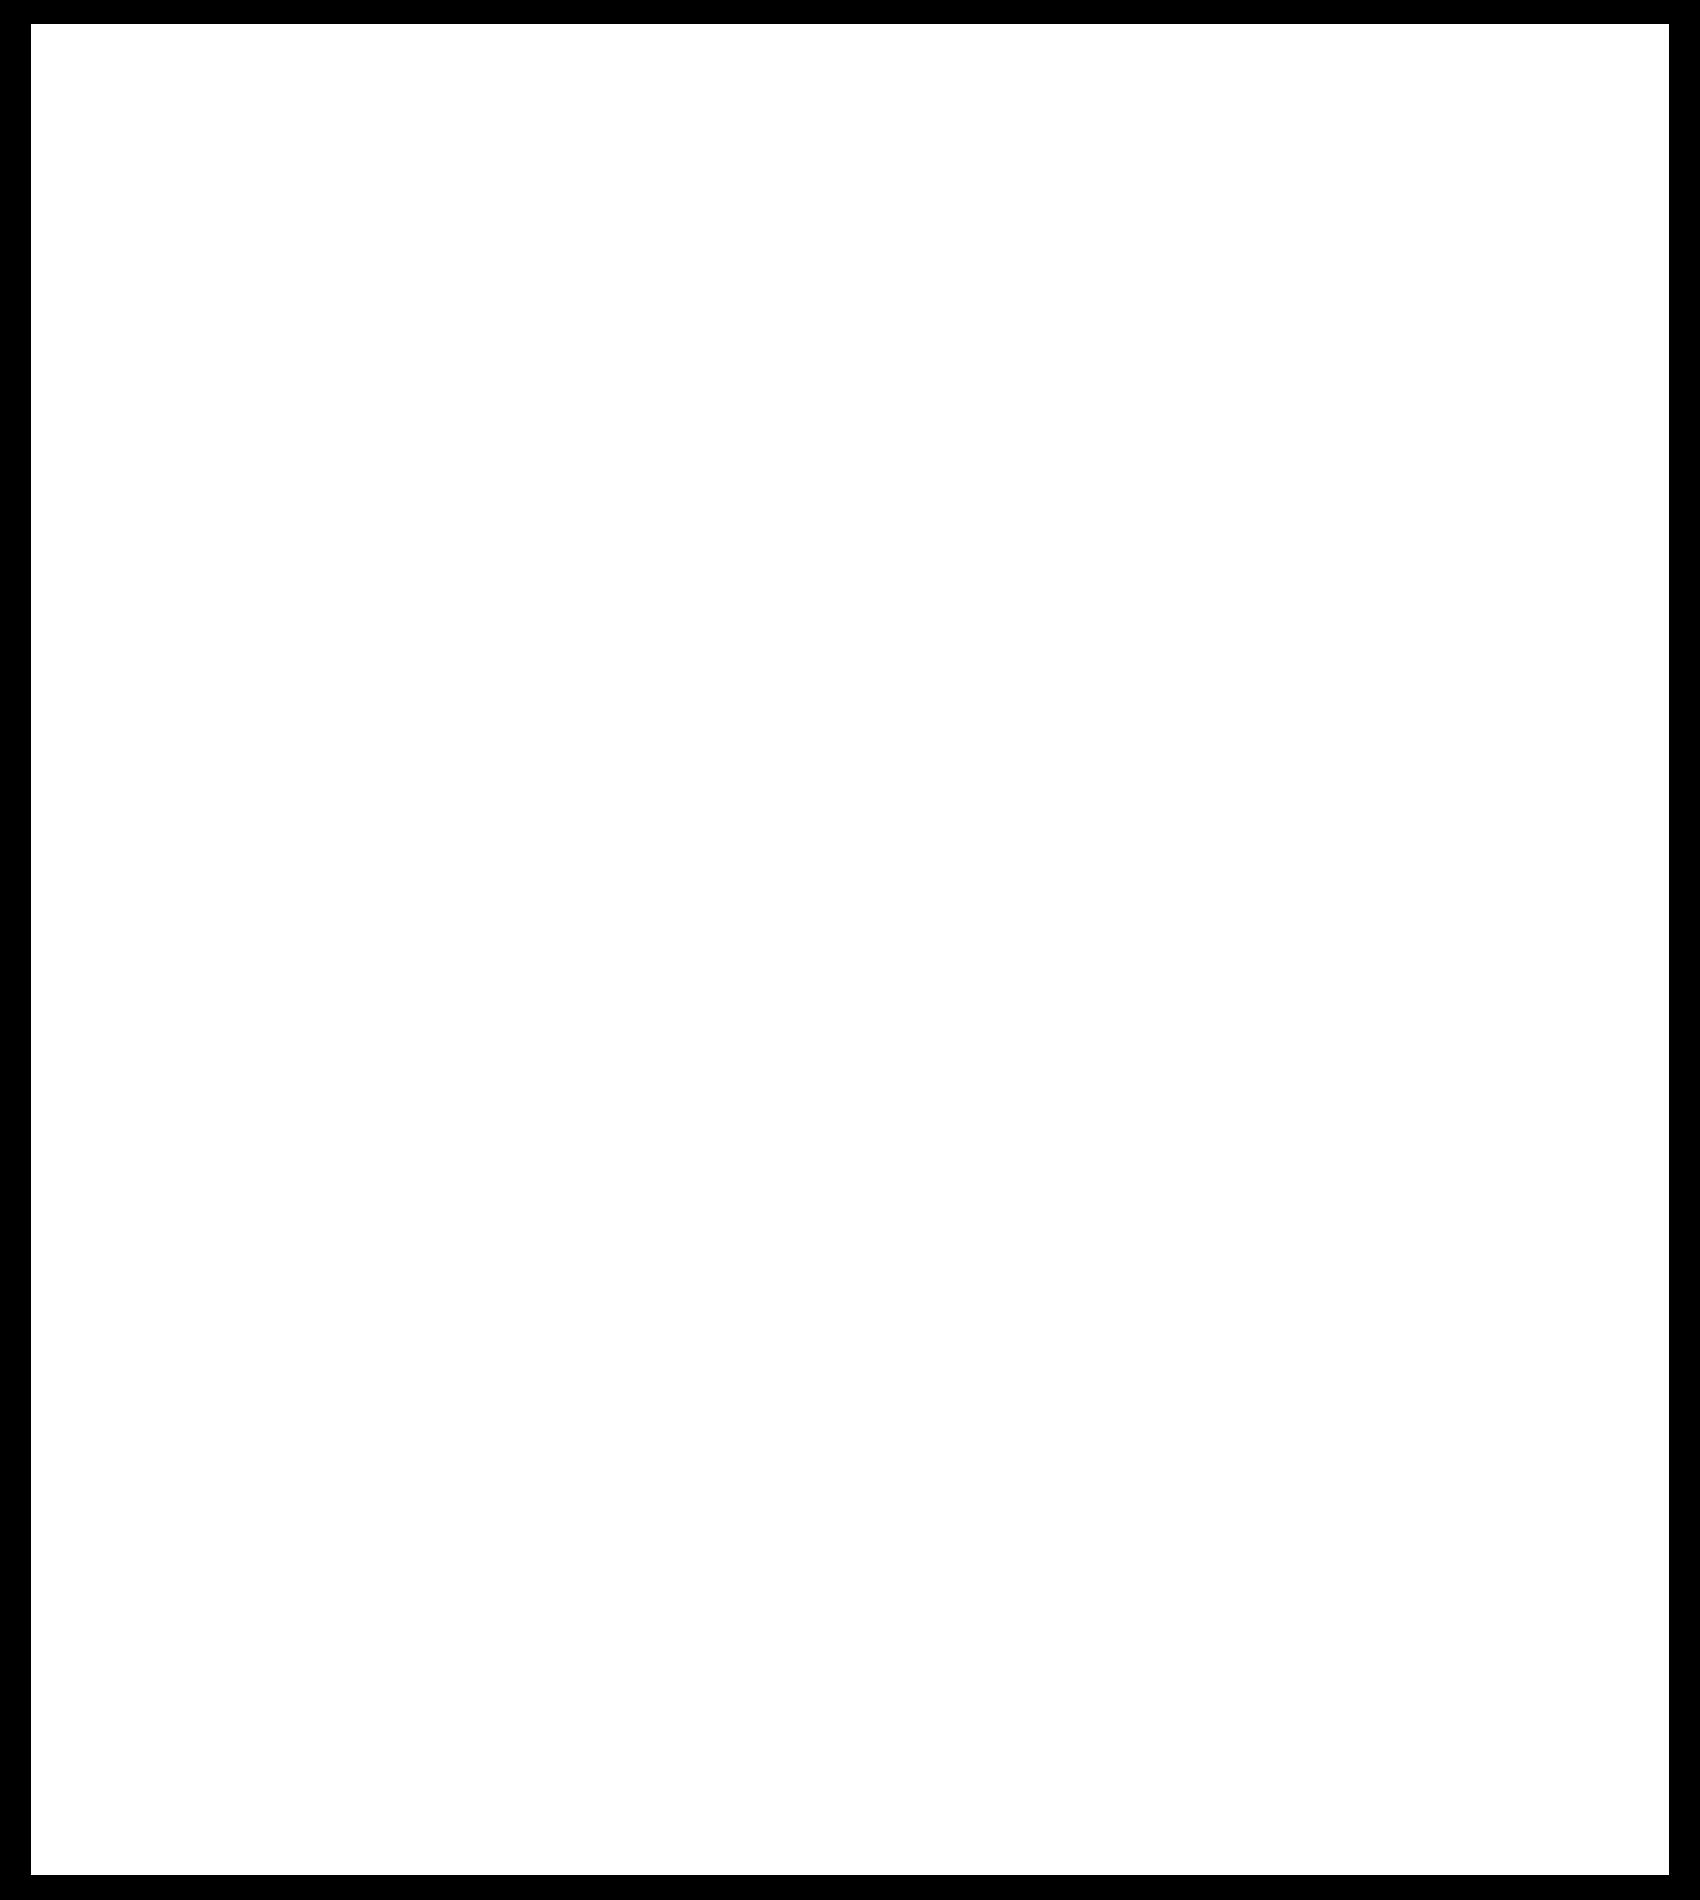 Square Box Photo Frame